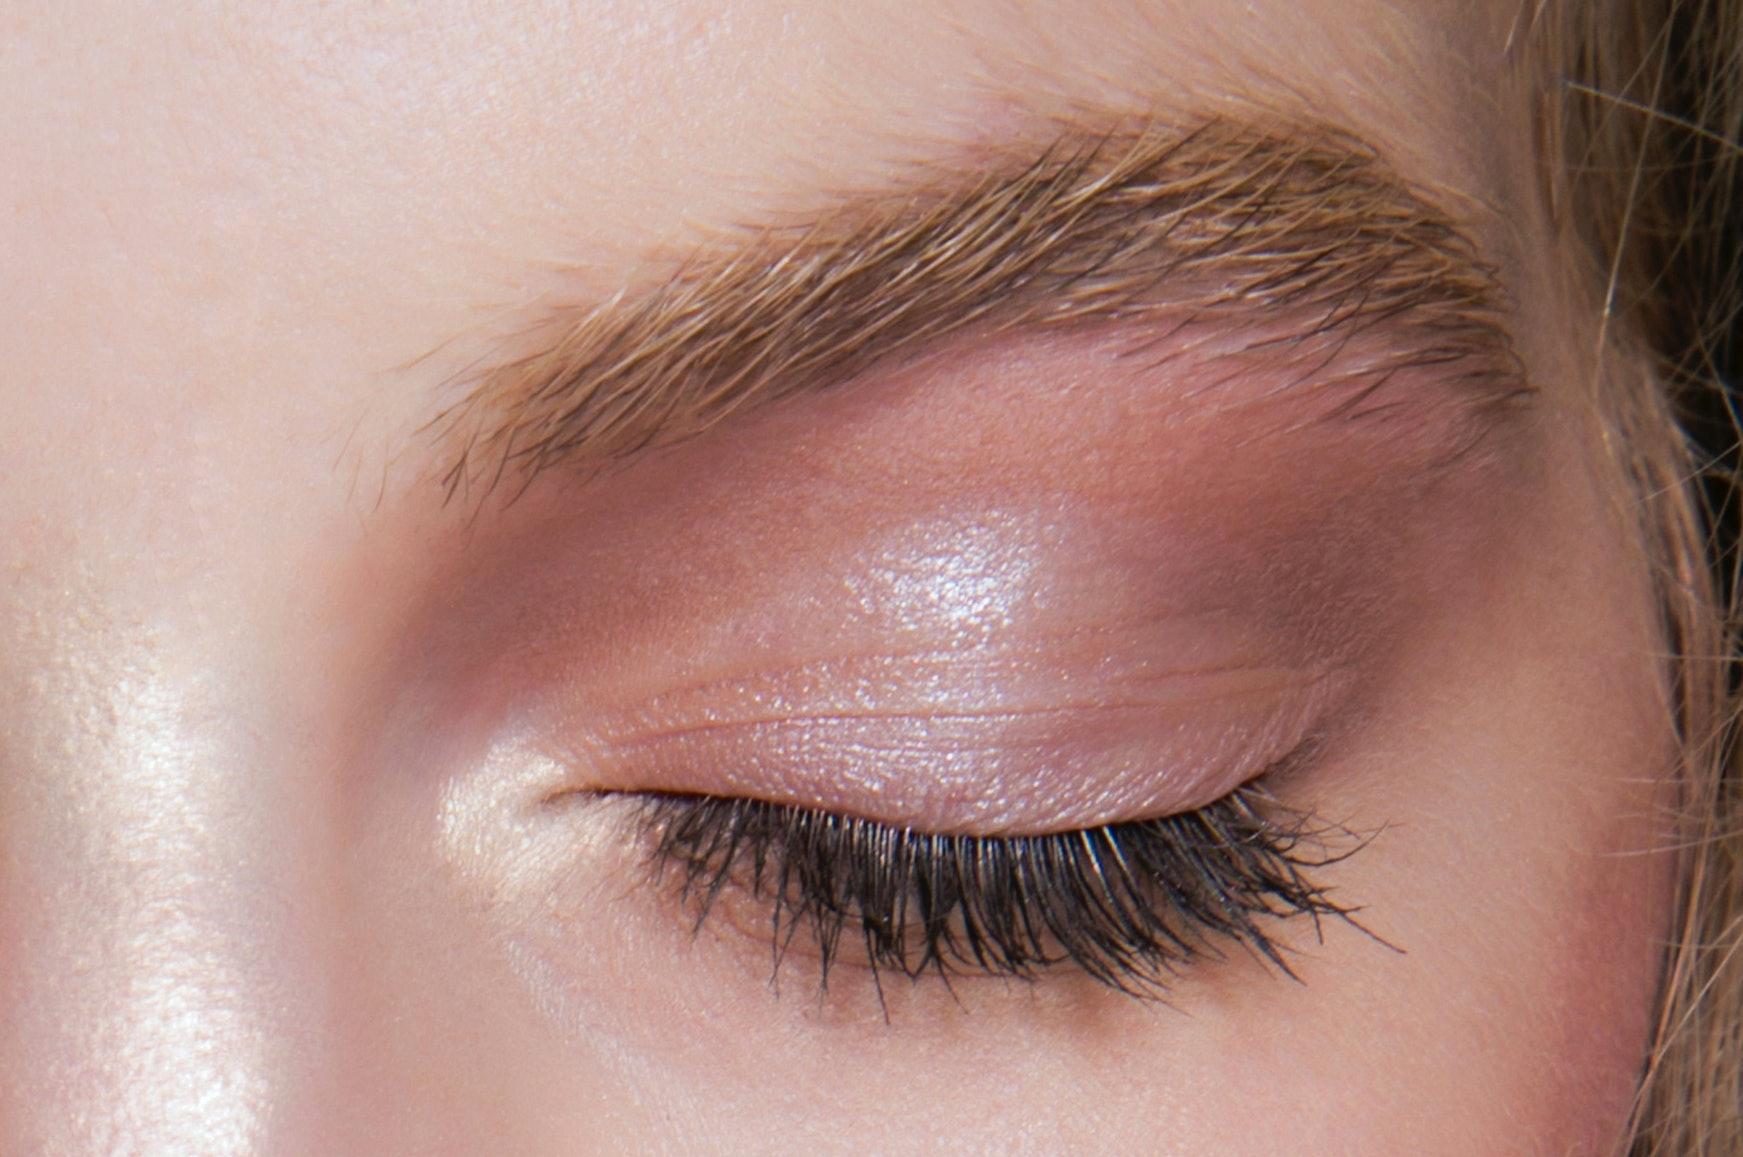 d83991b25cd 2019's Best New Mascaras That Work Wonders For My Hazel Eyes: Review